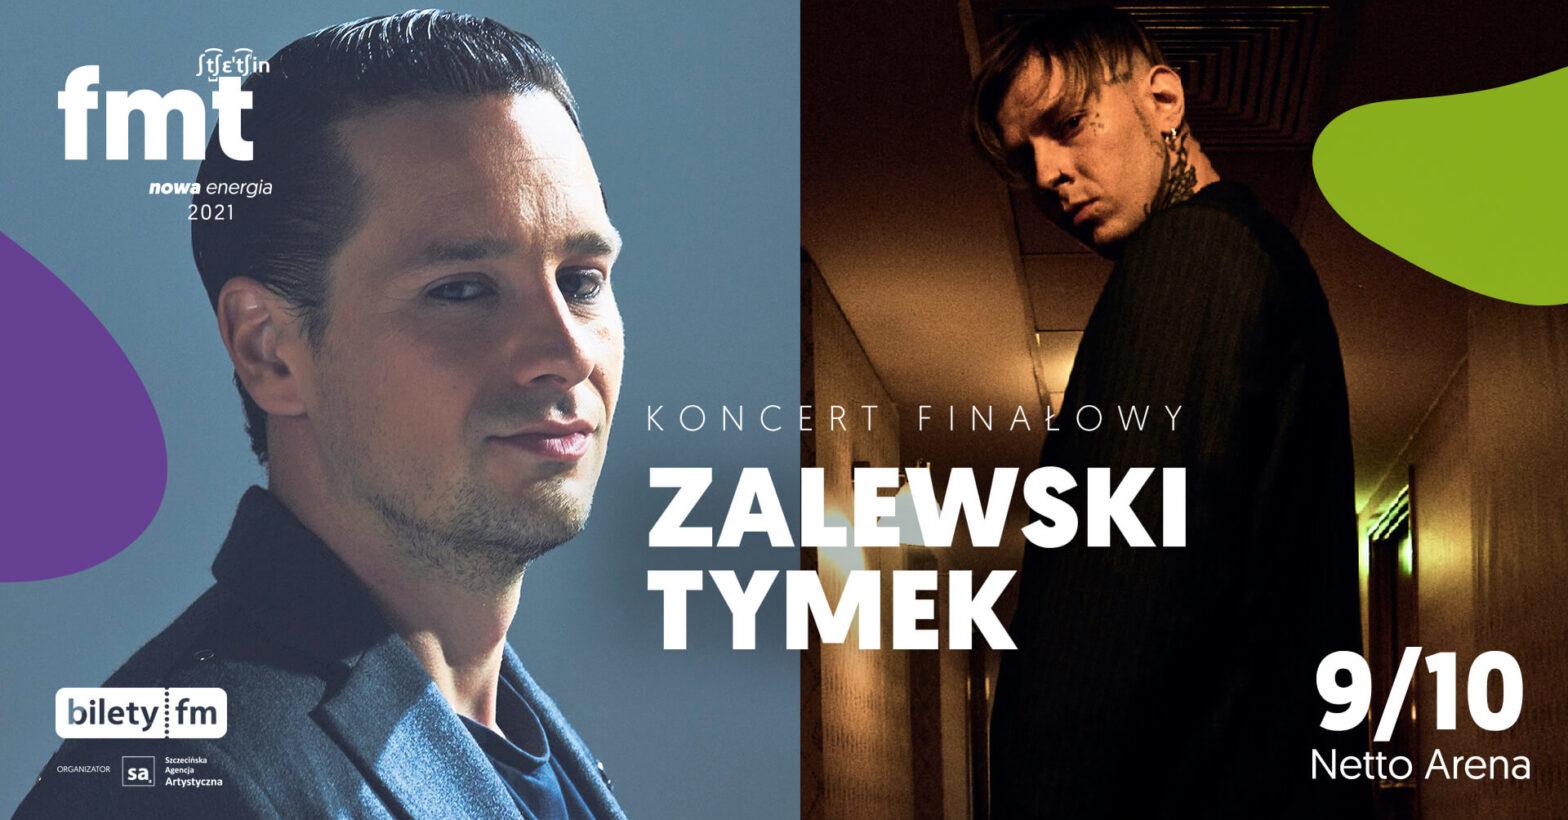 plakat festiwal młodych talentów